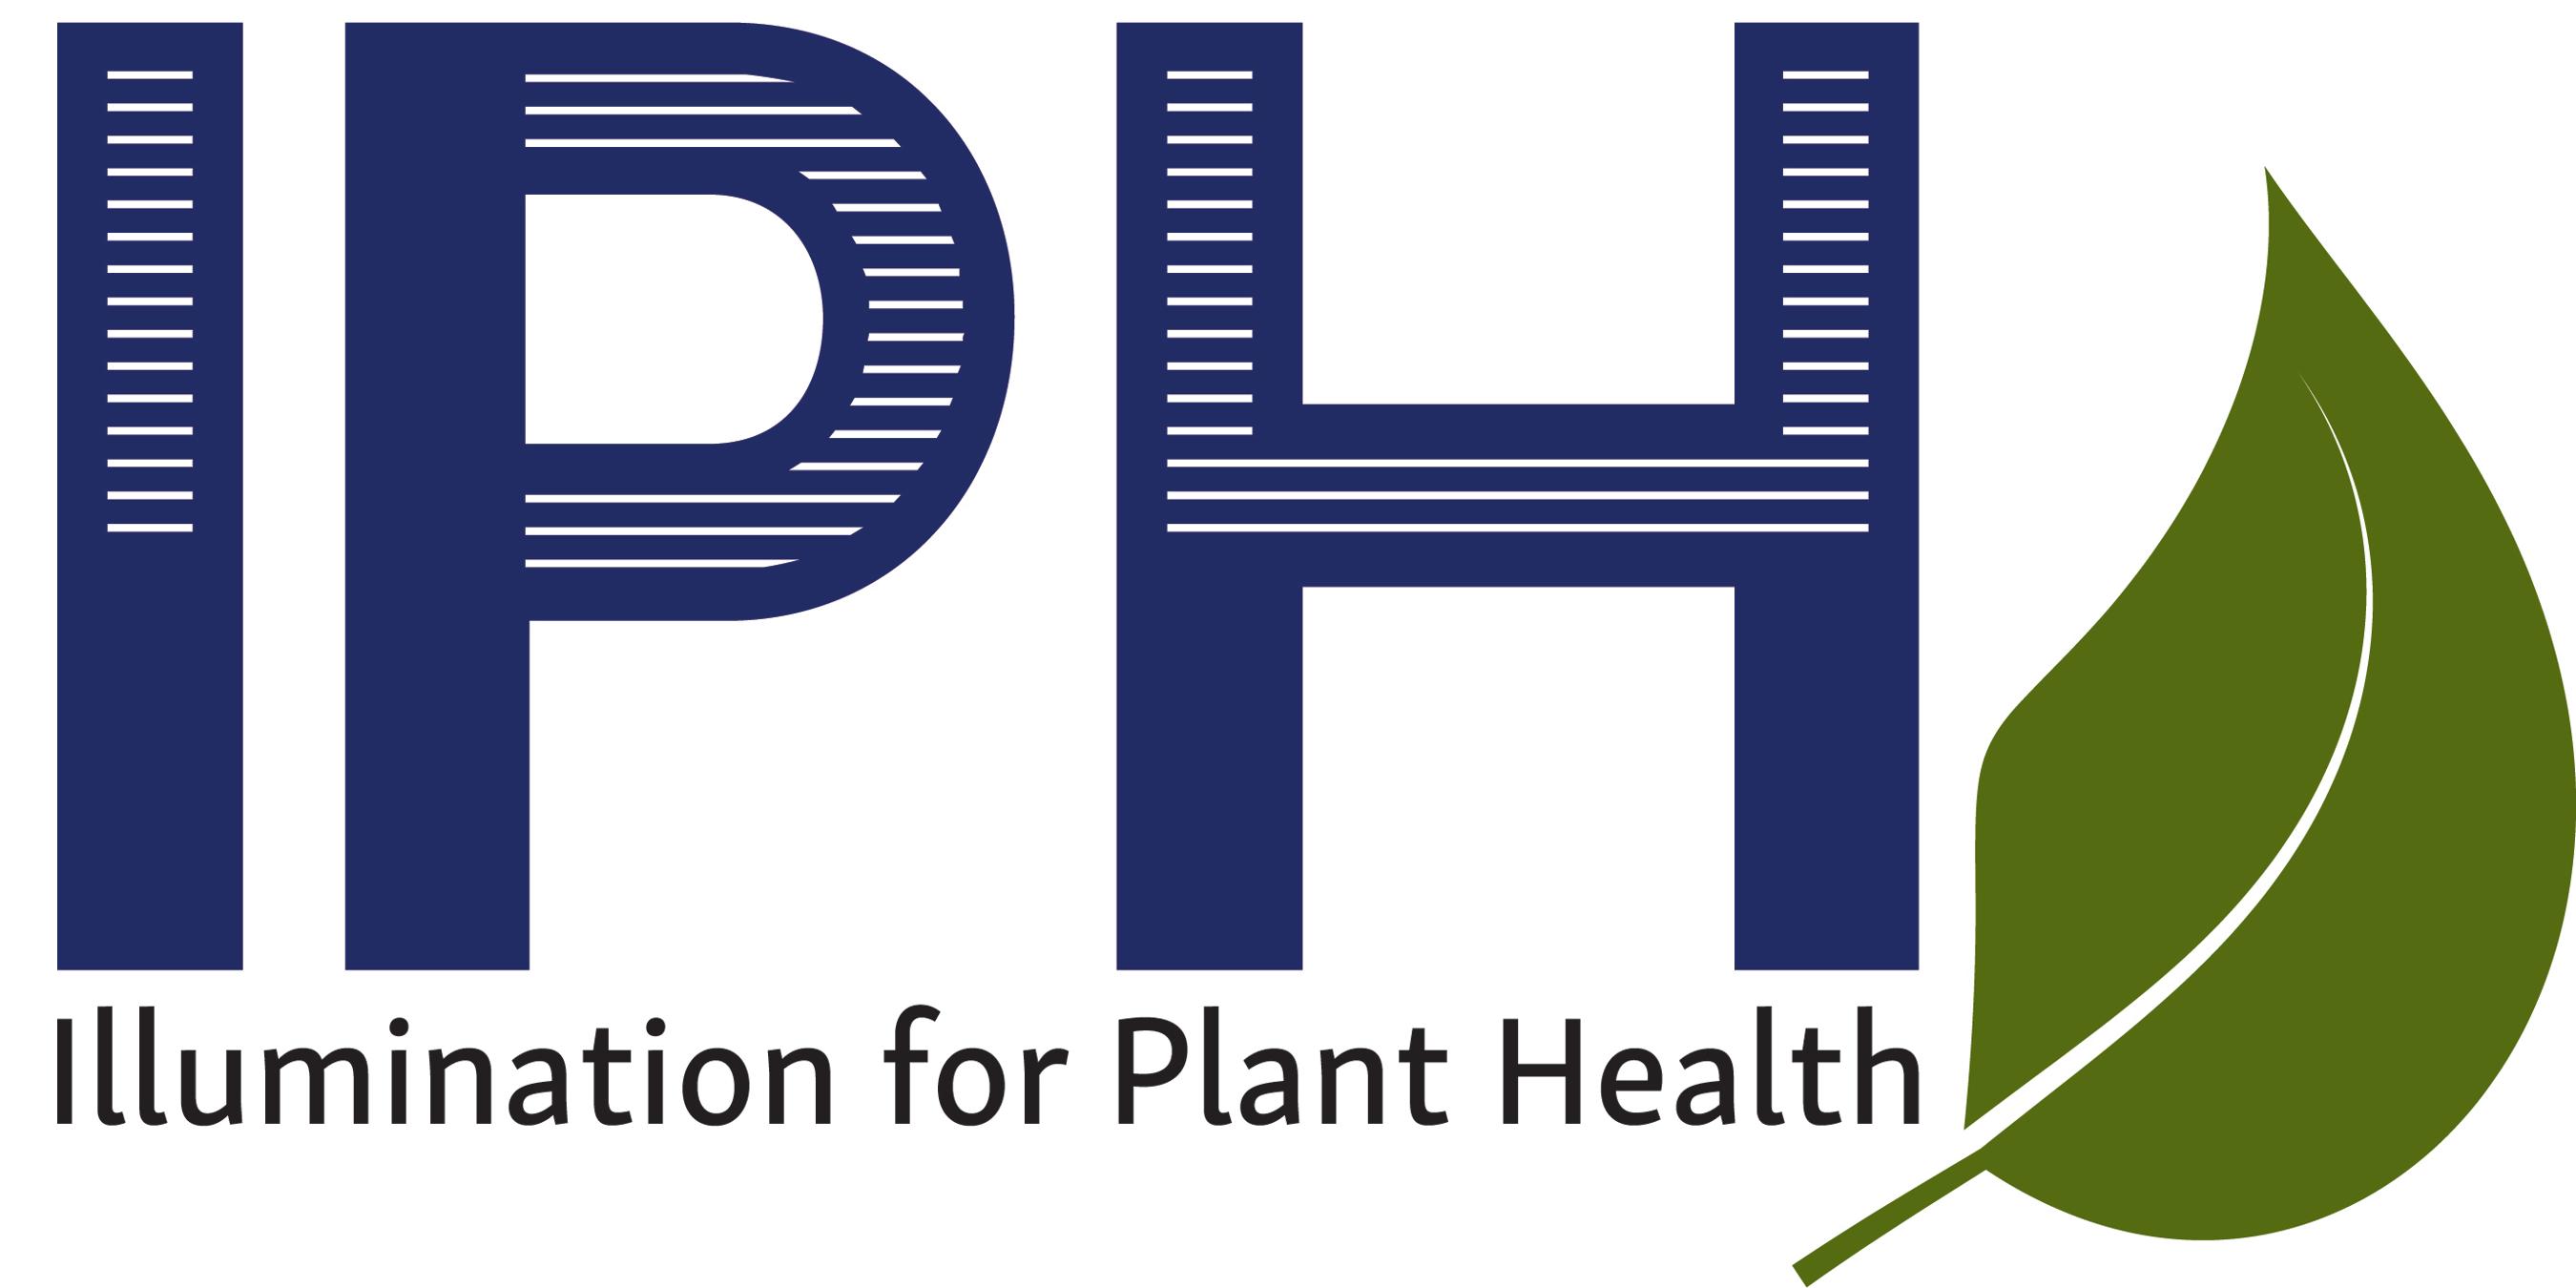 Illumination For Plant Health (IPH) Program U2014 Advancing Sustainable,  Innovative Strategies For Plant Disease Control Using The Latest Lighting  Technologies.